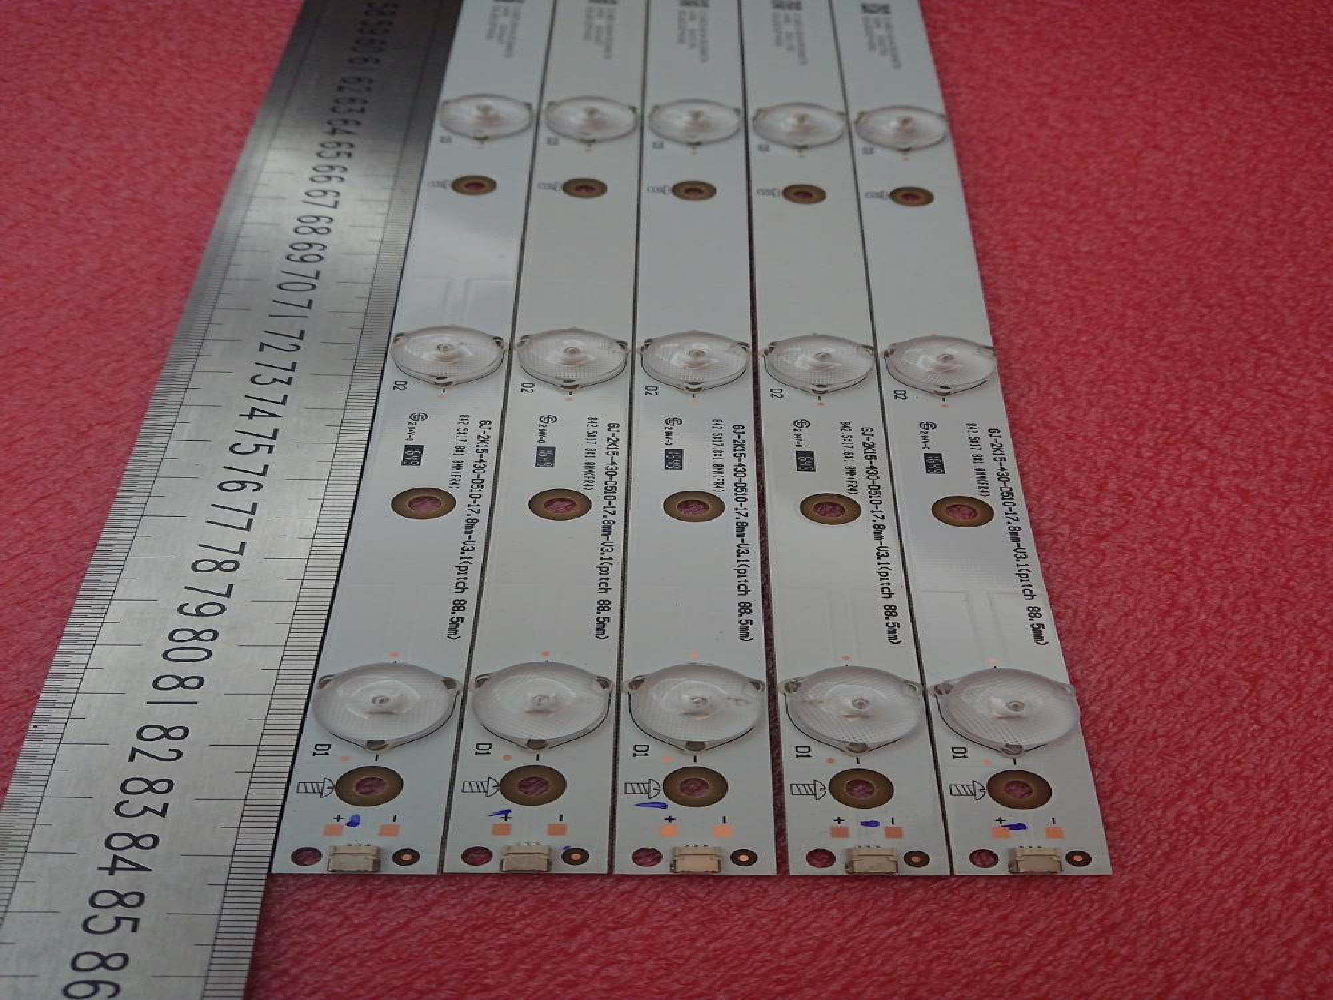 TONEKING TO600 600ohm High Impedance Earbud HIFI Earbud High Impedance Stereo Metal Earphone With Detachable Detach